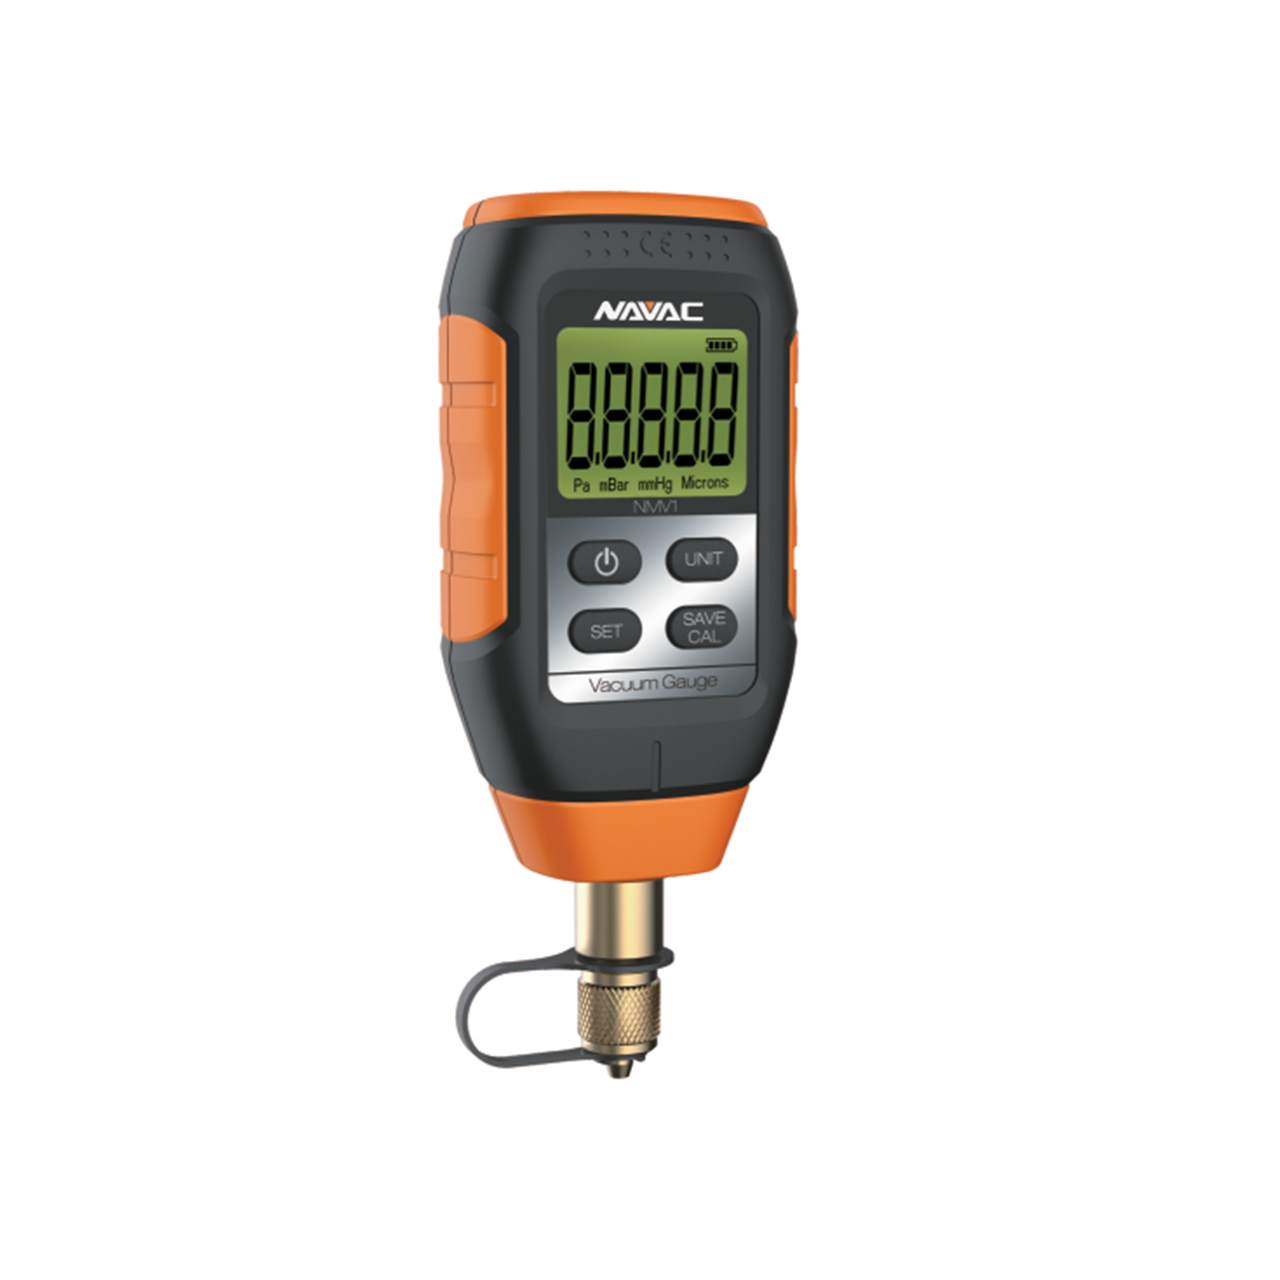 Micron Vacuum Gauge - NMV1